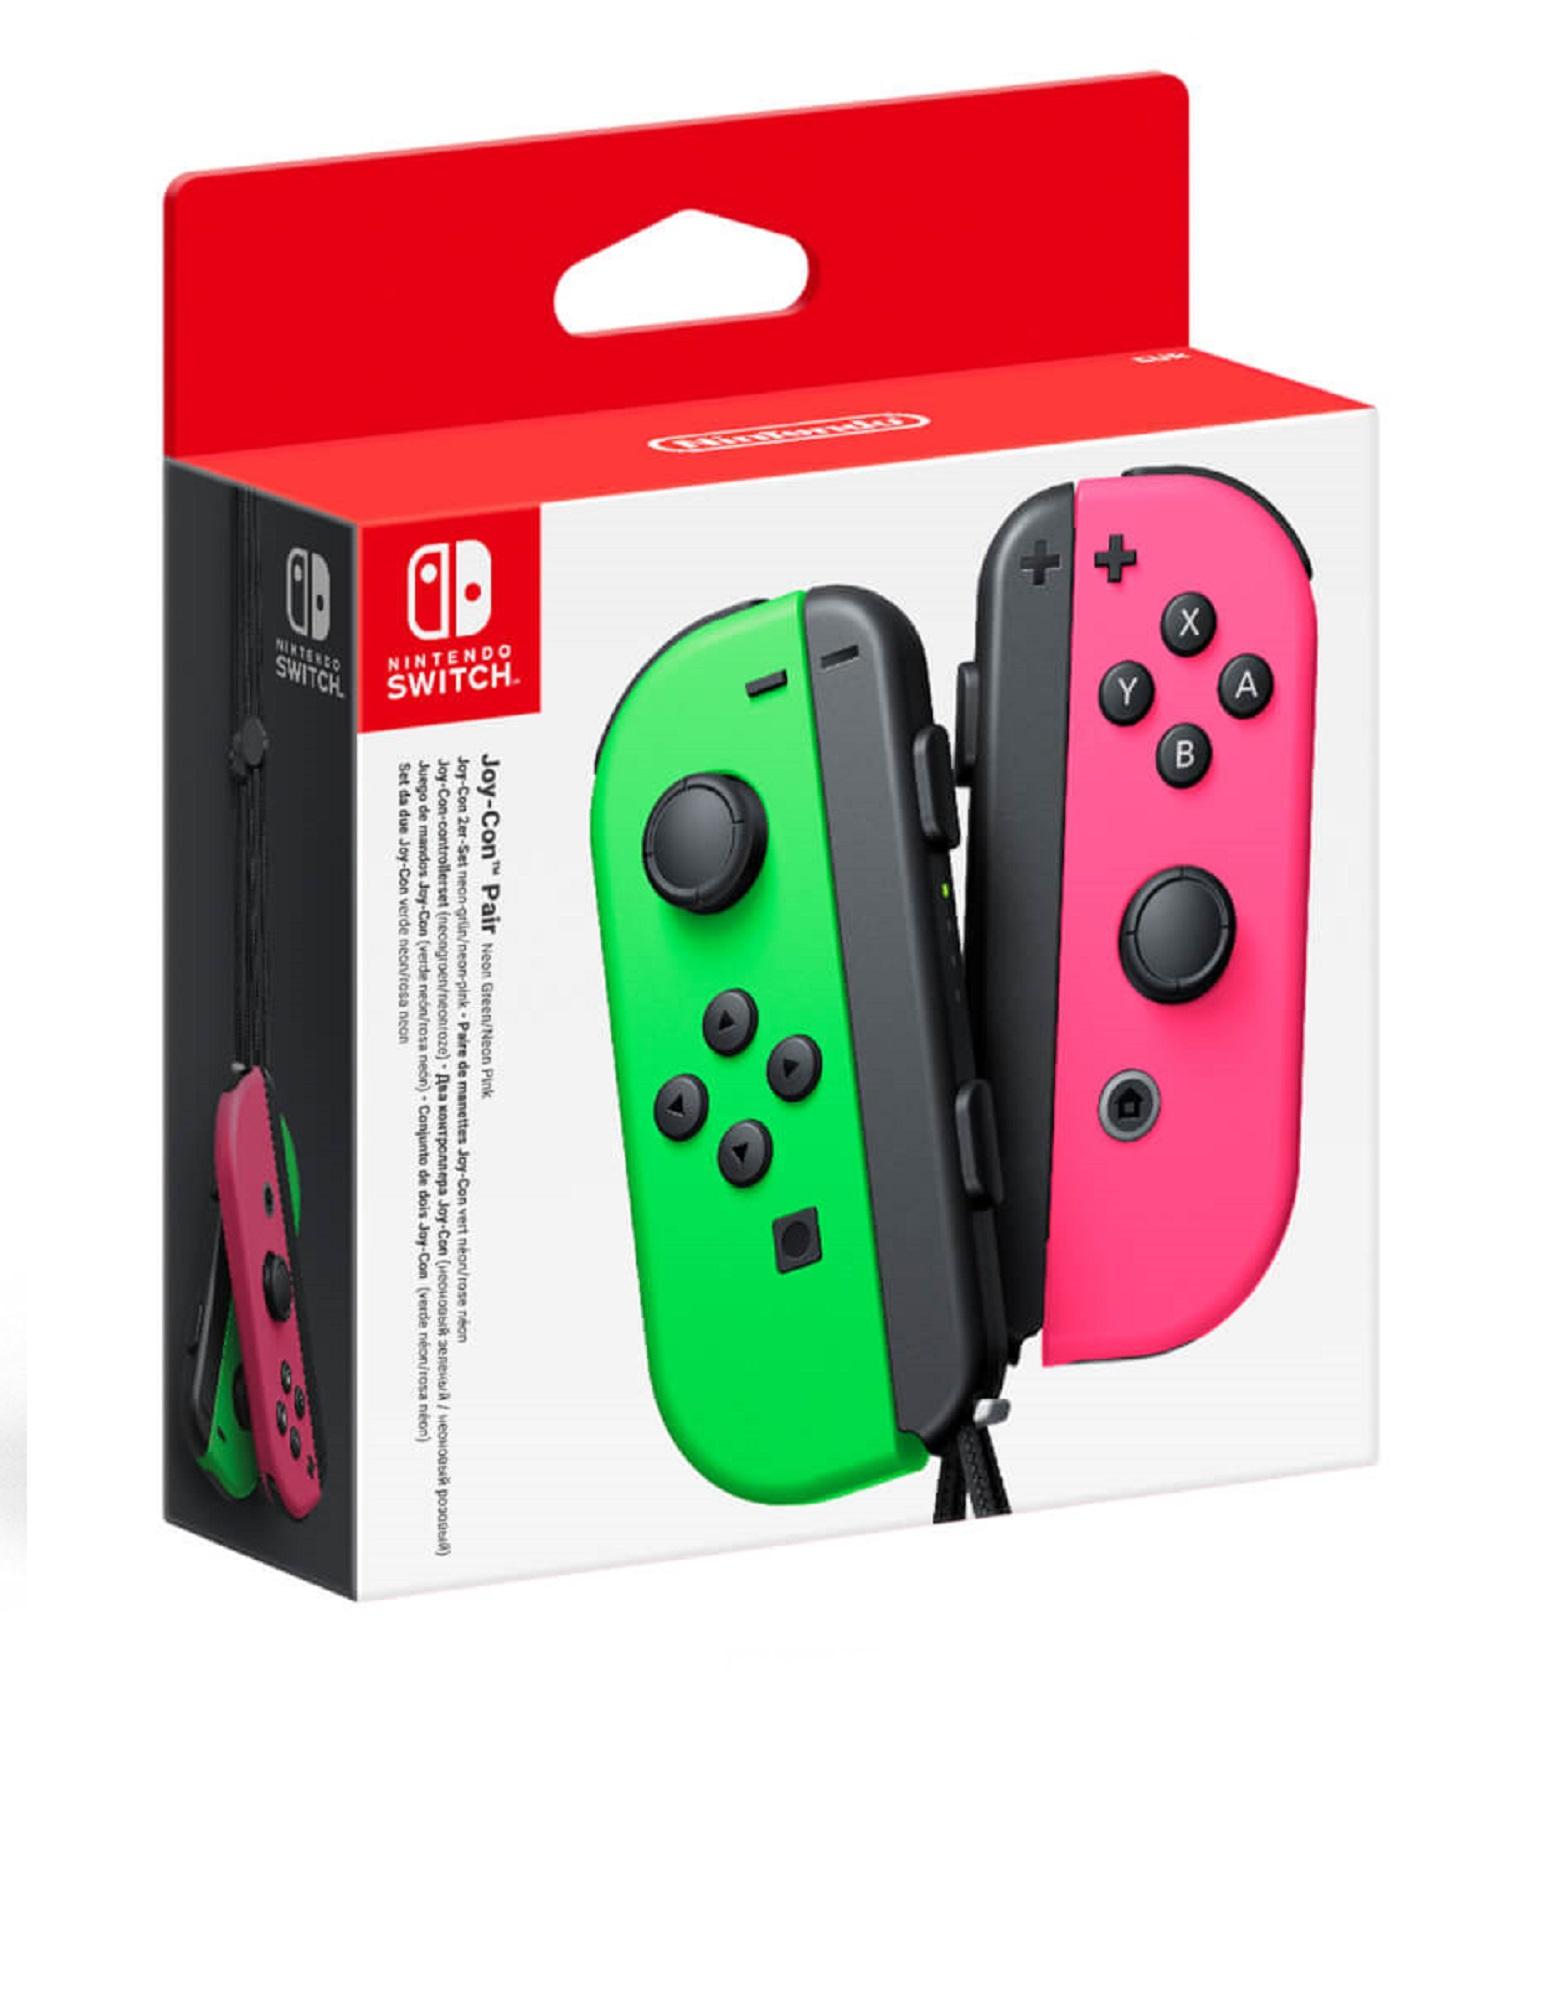 Nintendo Switch Joy-Con Controllers Splatoon 2 Edition [Pair]